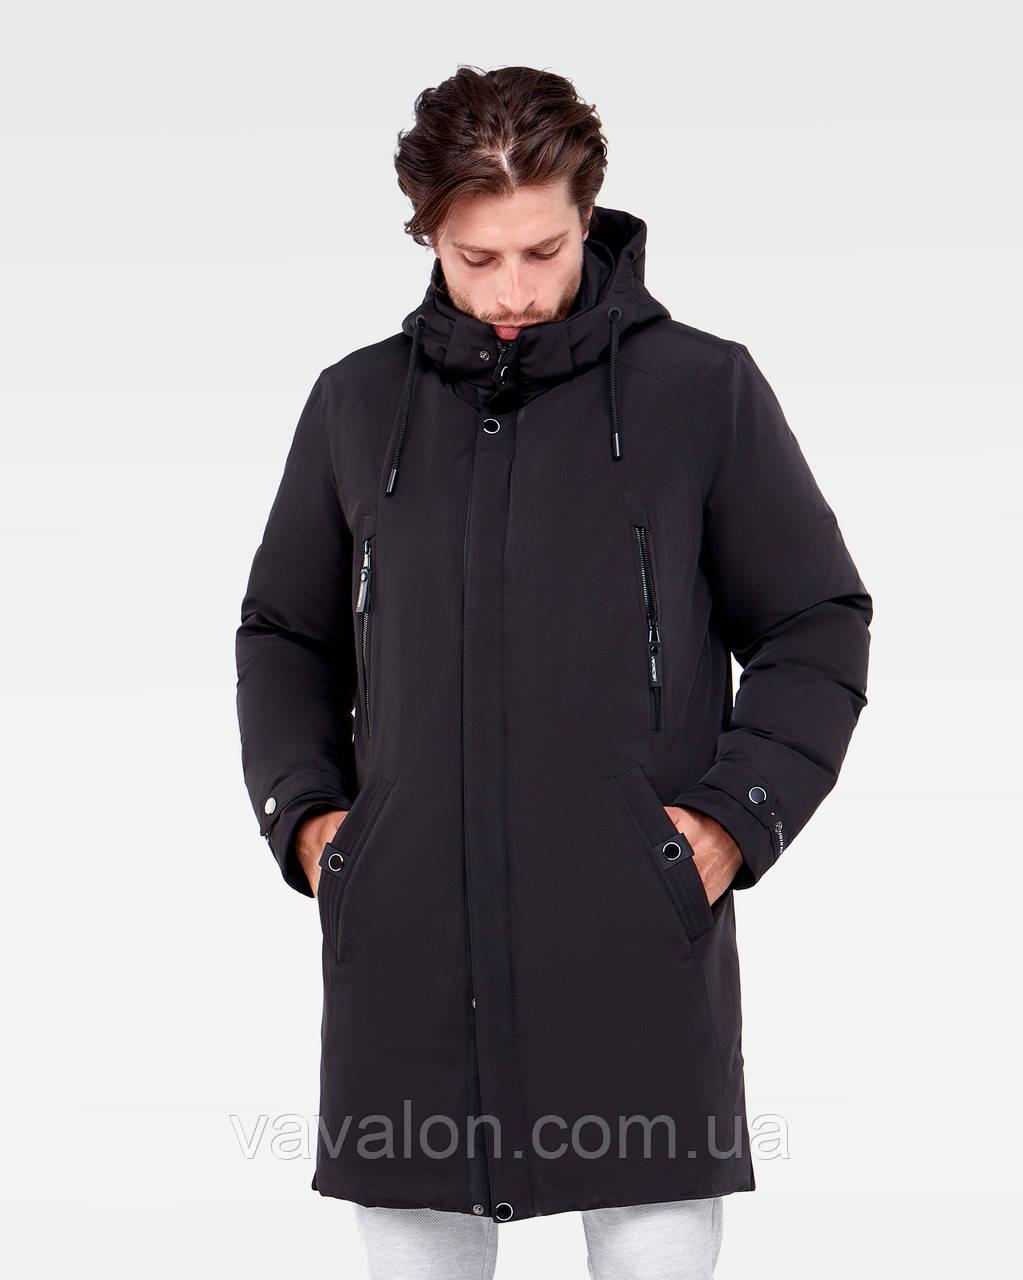 Зимняя мужская куртка Vavalon KZ-P909 black